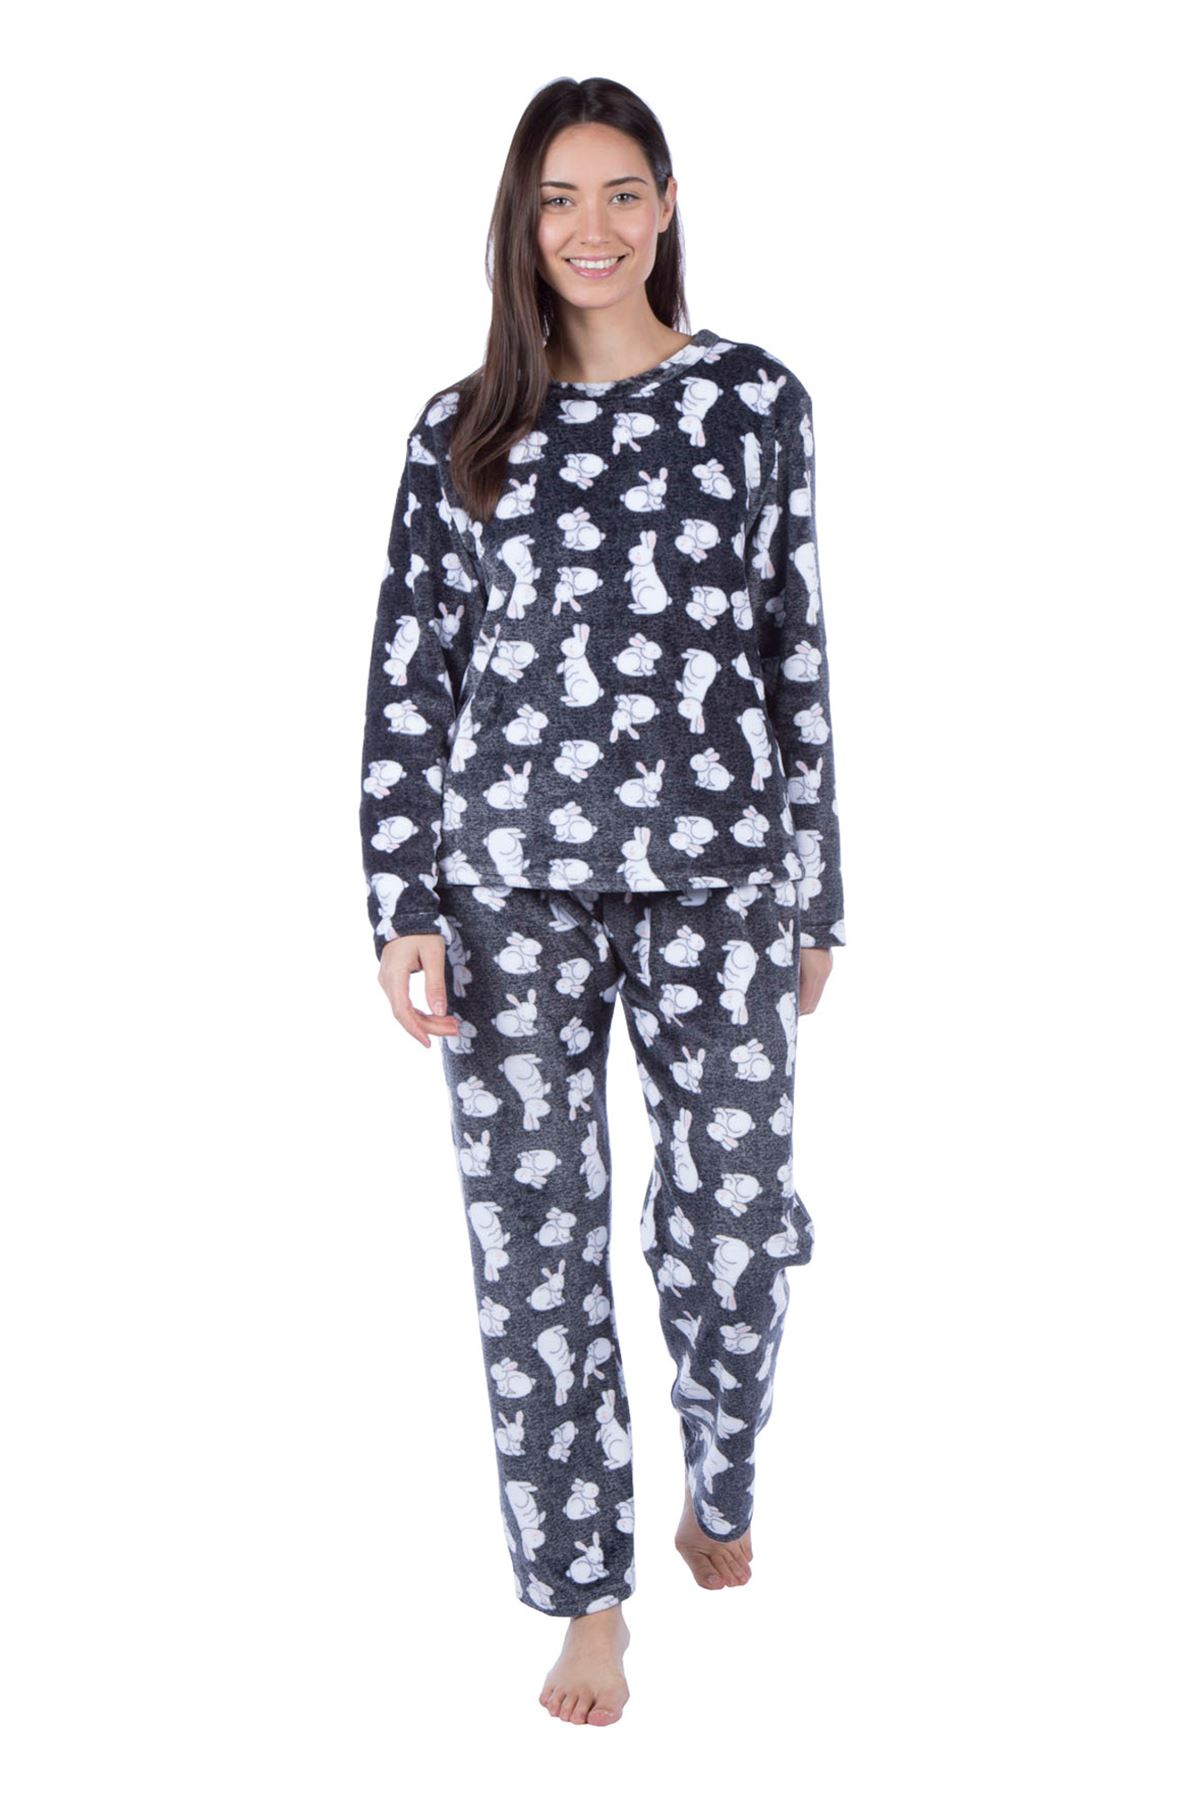 645d9cfd3a Ladies Flannel Fleece Pyjama Set Long Sleeve Ruby Rabit Crewneck Warm  Loungewear